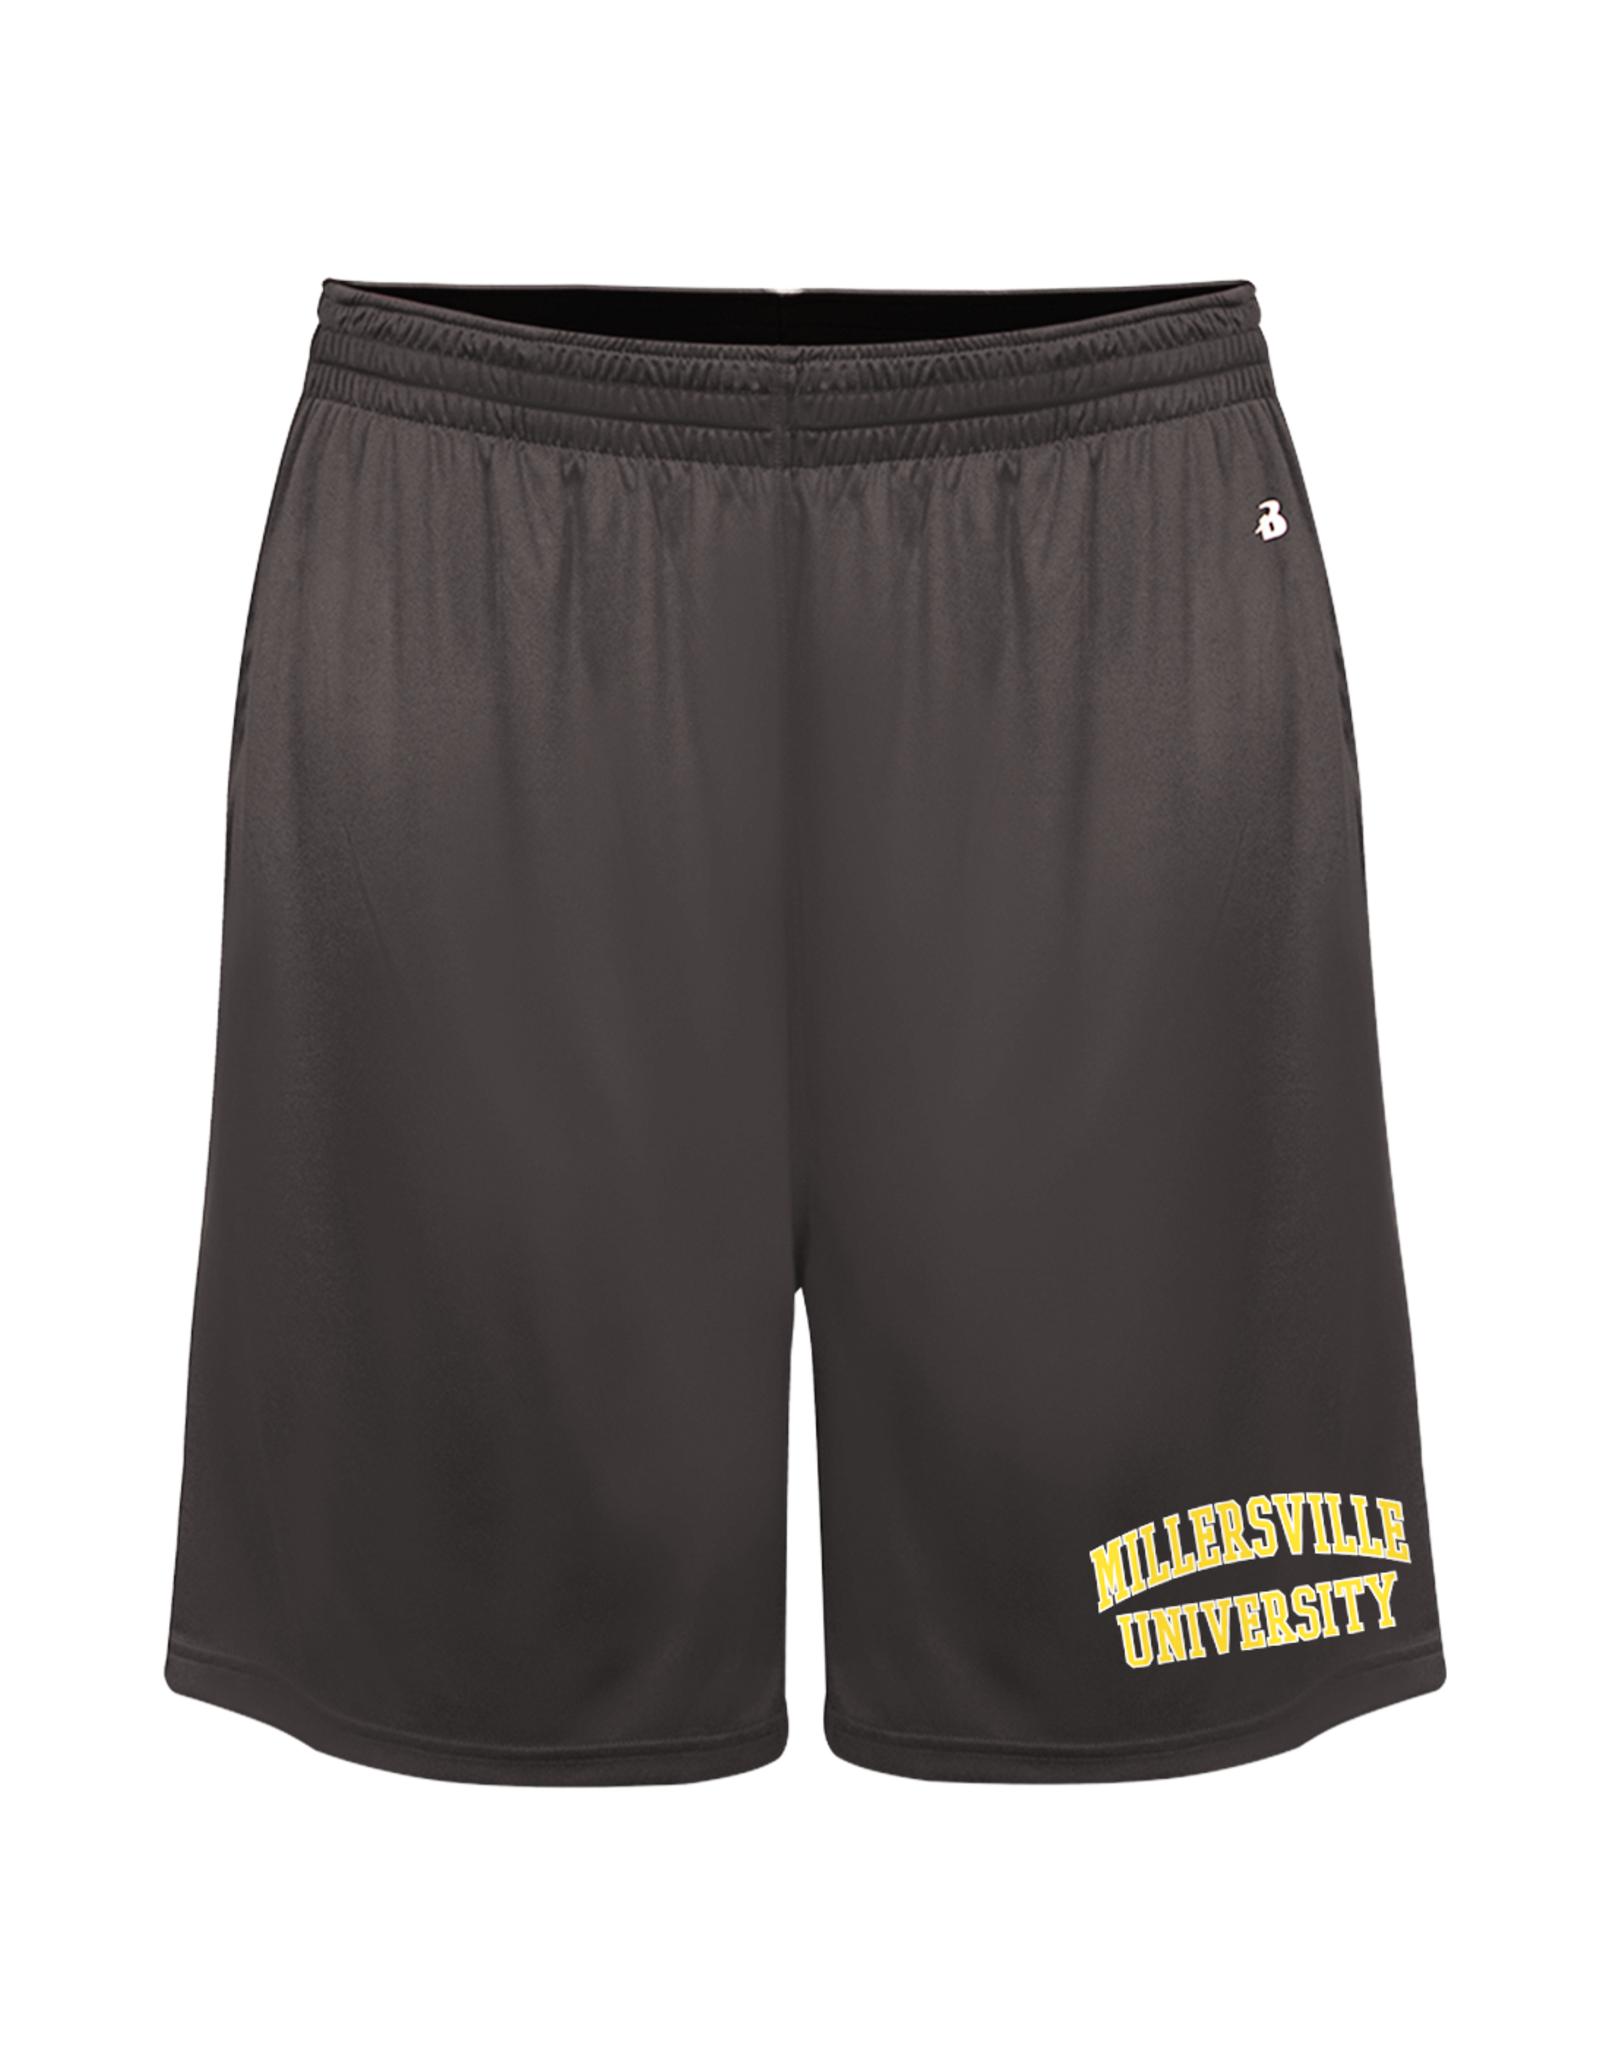 Ultimate Softlock Shorts - Sale!